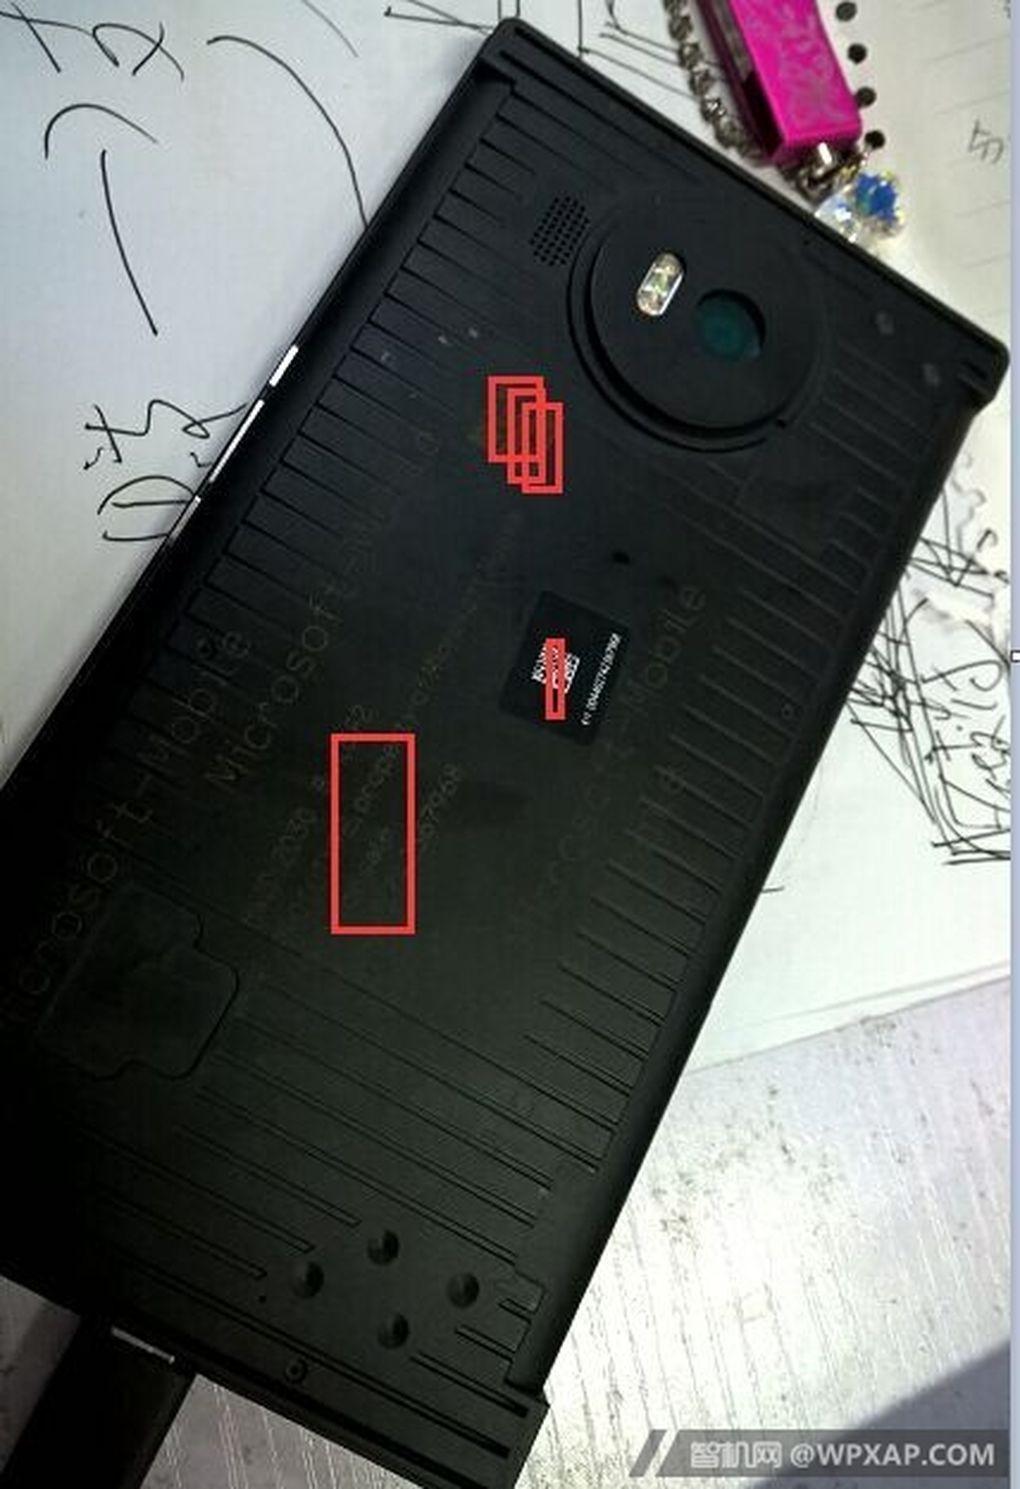 1440090178_alleged-lumia-950.jpg